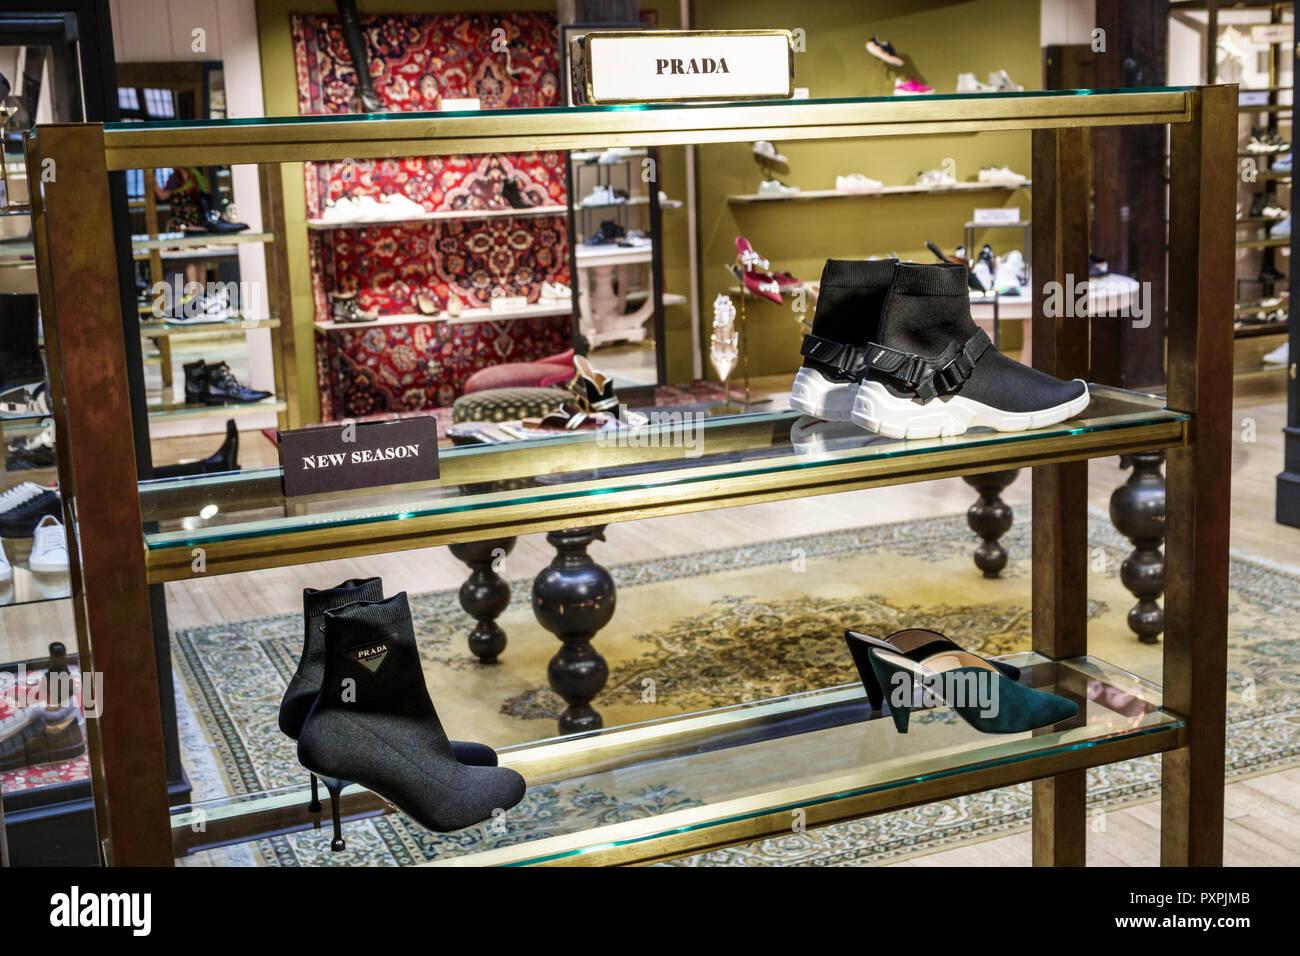 2af40c46f01 London England United Kingdom Great Britain Soho Liberty Department Store  shopping luxury brands upmarket women s shoes designer Prada display sale